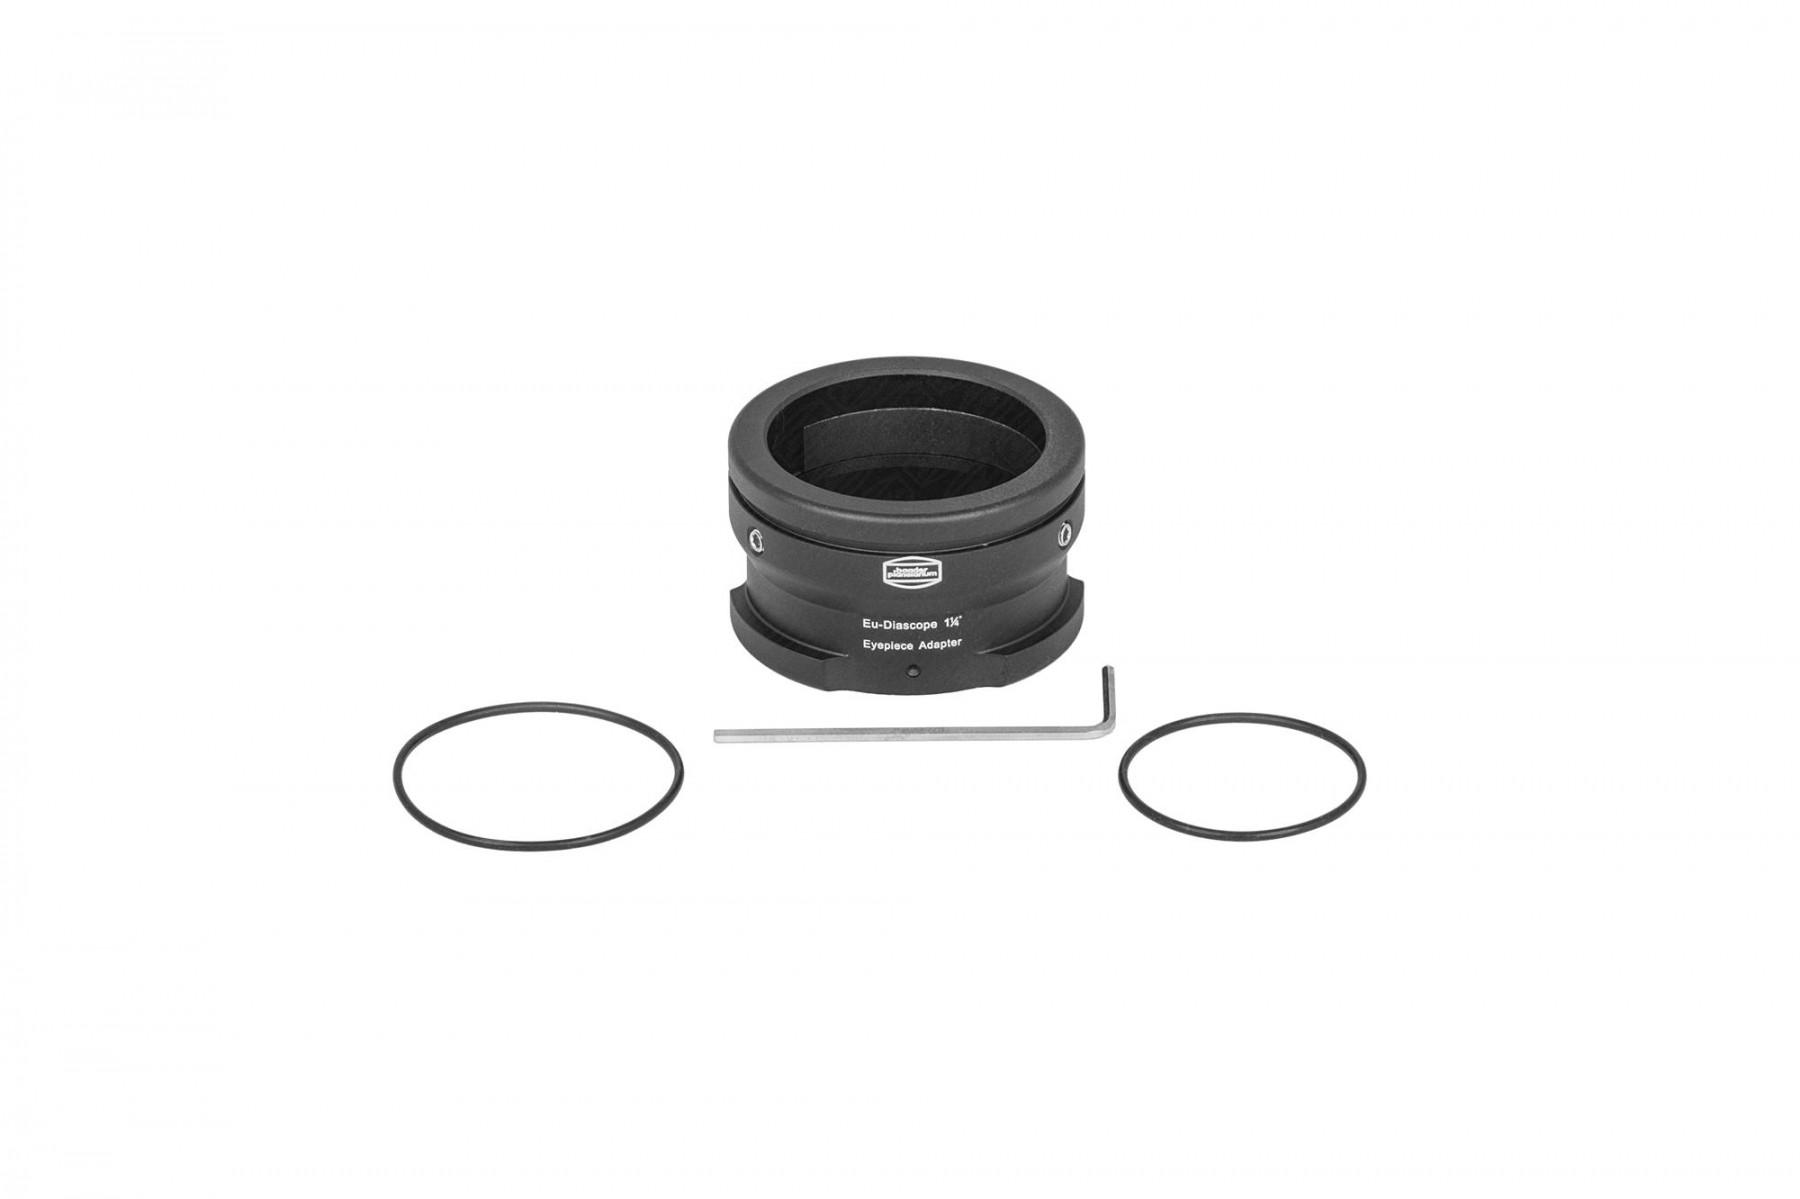 Lieferumfang: Classic Ortho 6mm (nicht abgebildet) Zeiss Diascope Okularbajonett, Inbusschlüssel, 2x O-Ringe